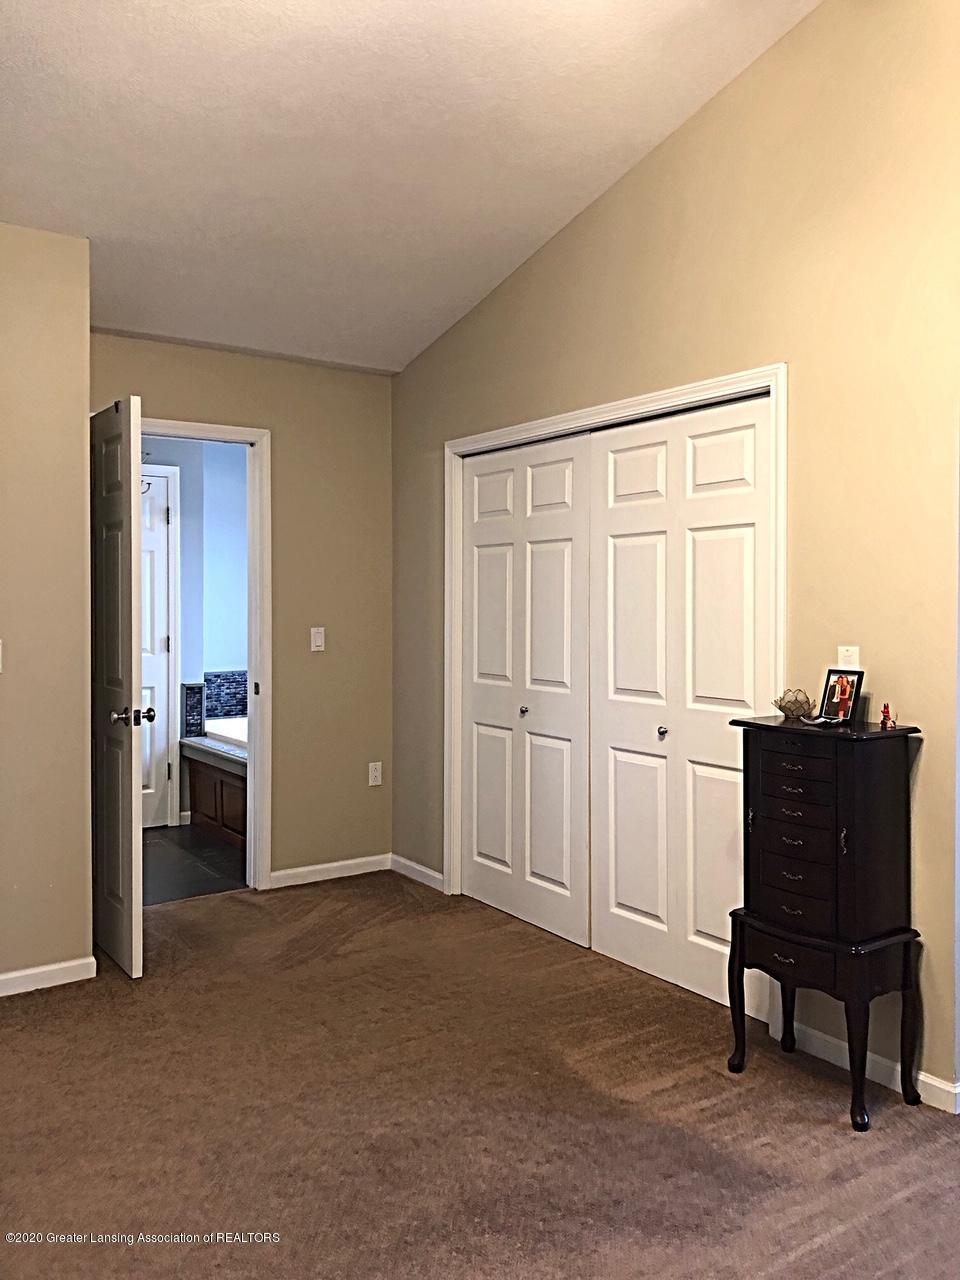 5910 Hickory Hill Dr - master room - 25